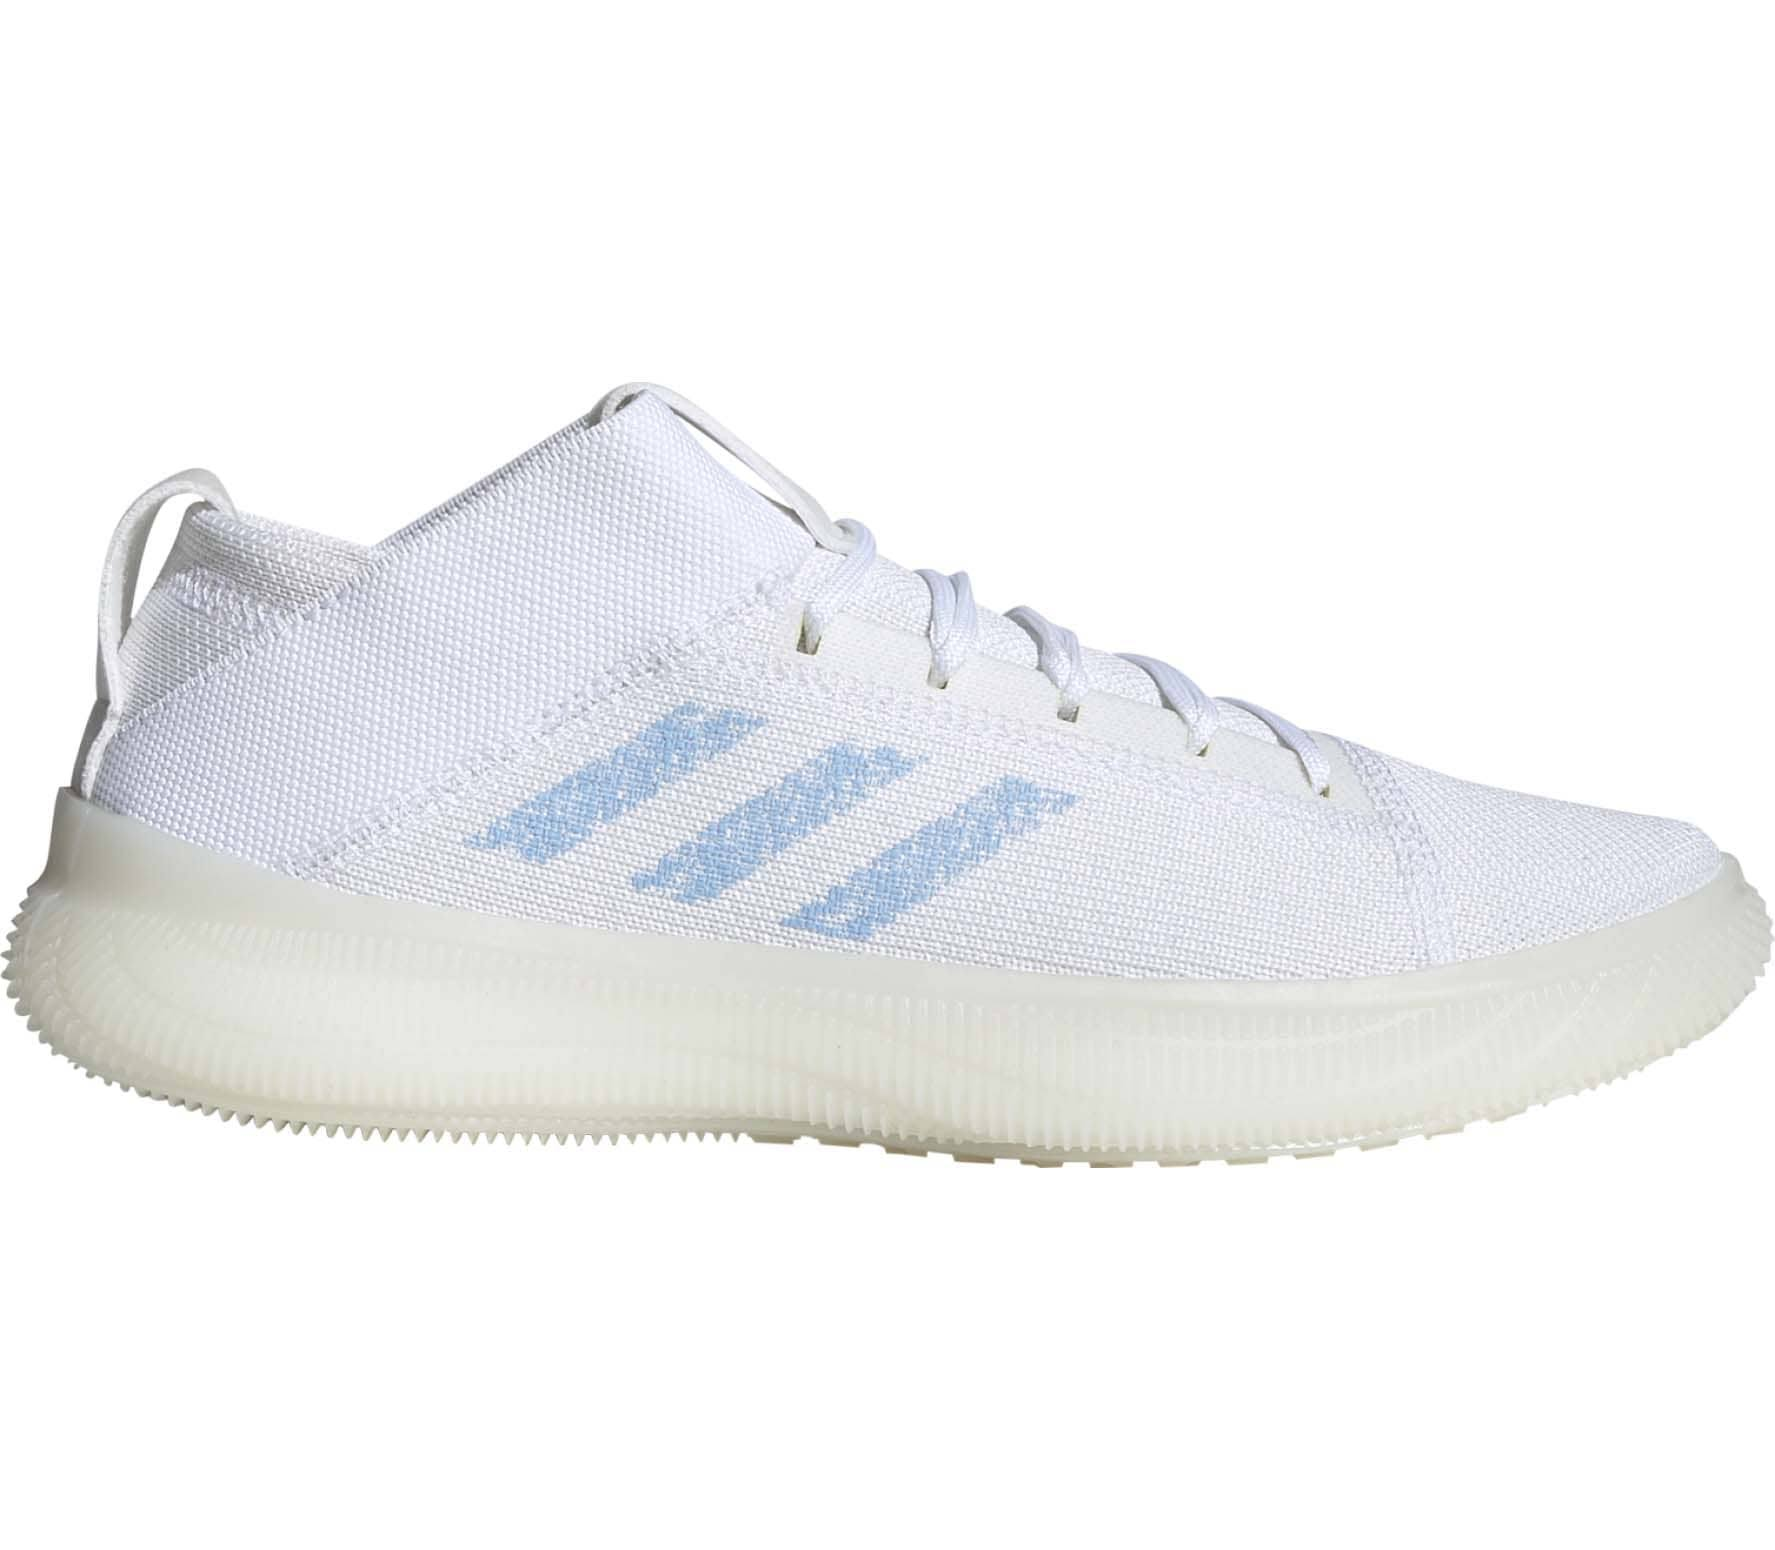 Adidas Pureboost Trainer Shoes Training - White - Women